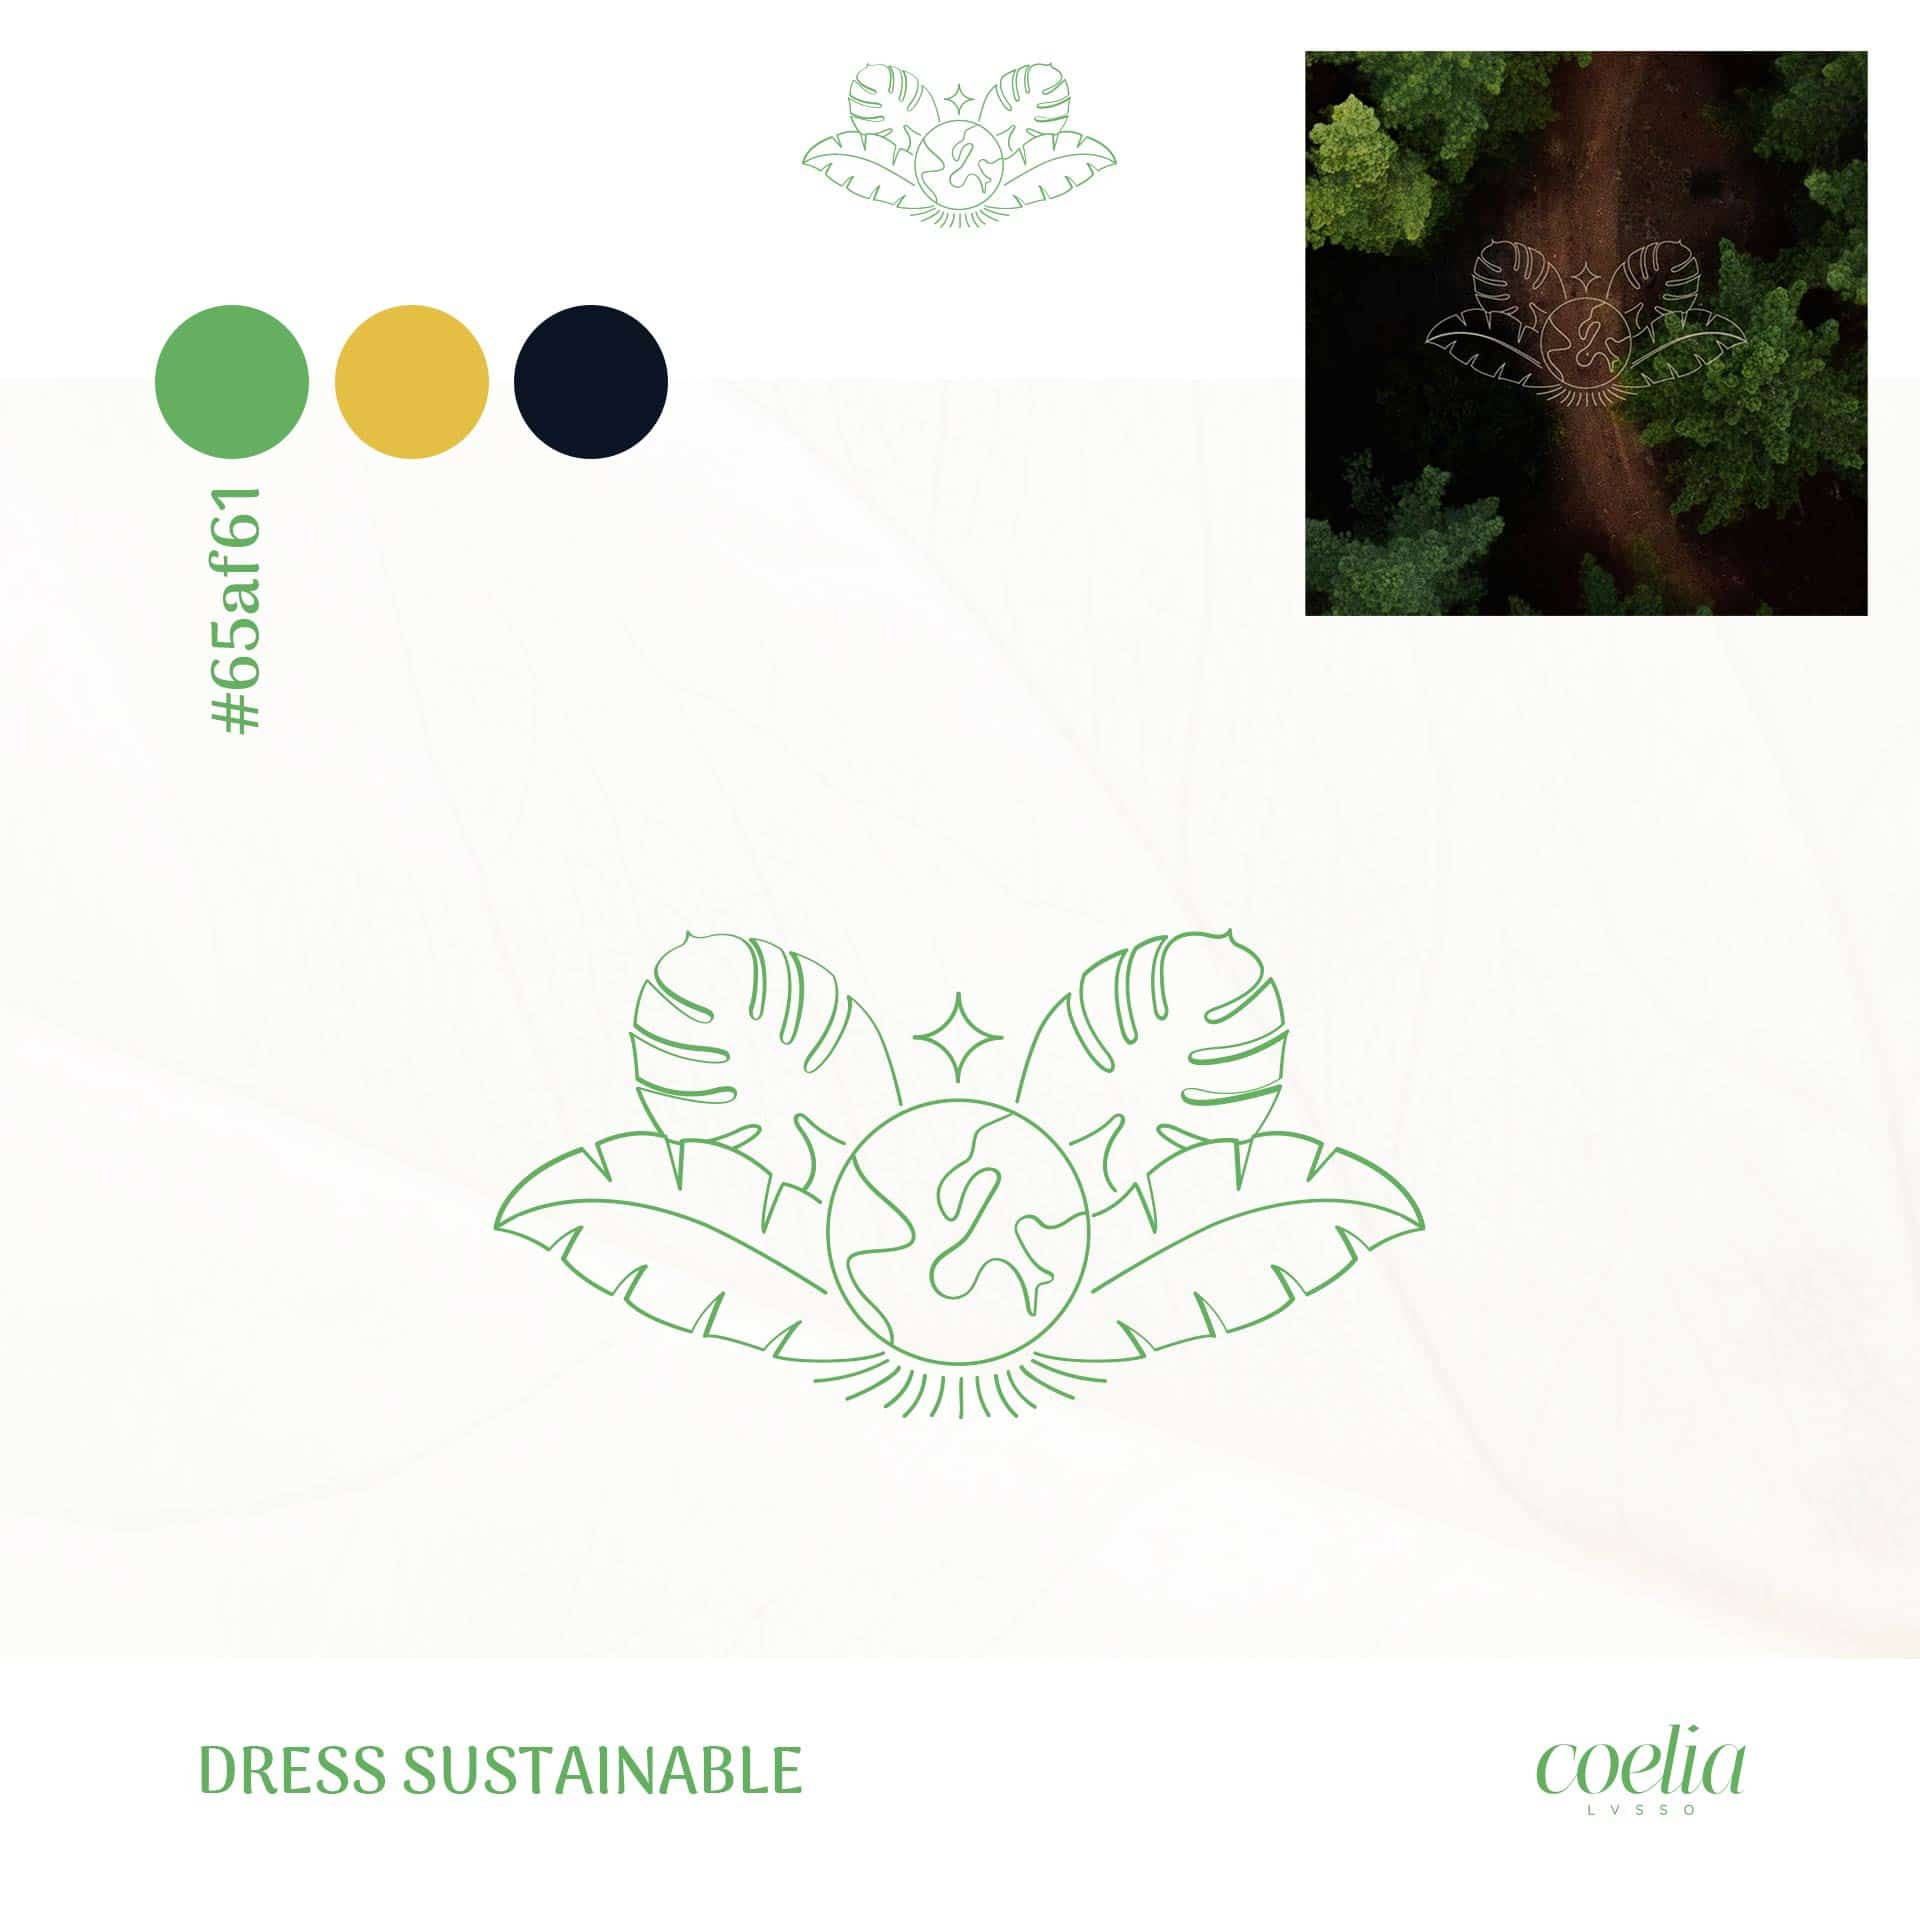 coelia lusso grafico milano sustainability